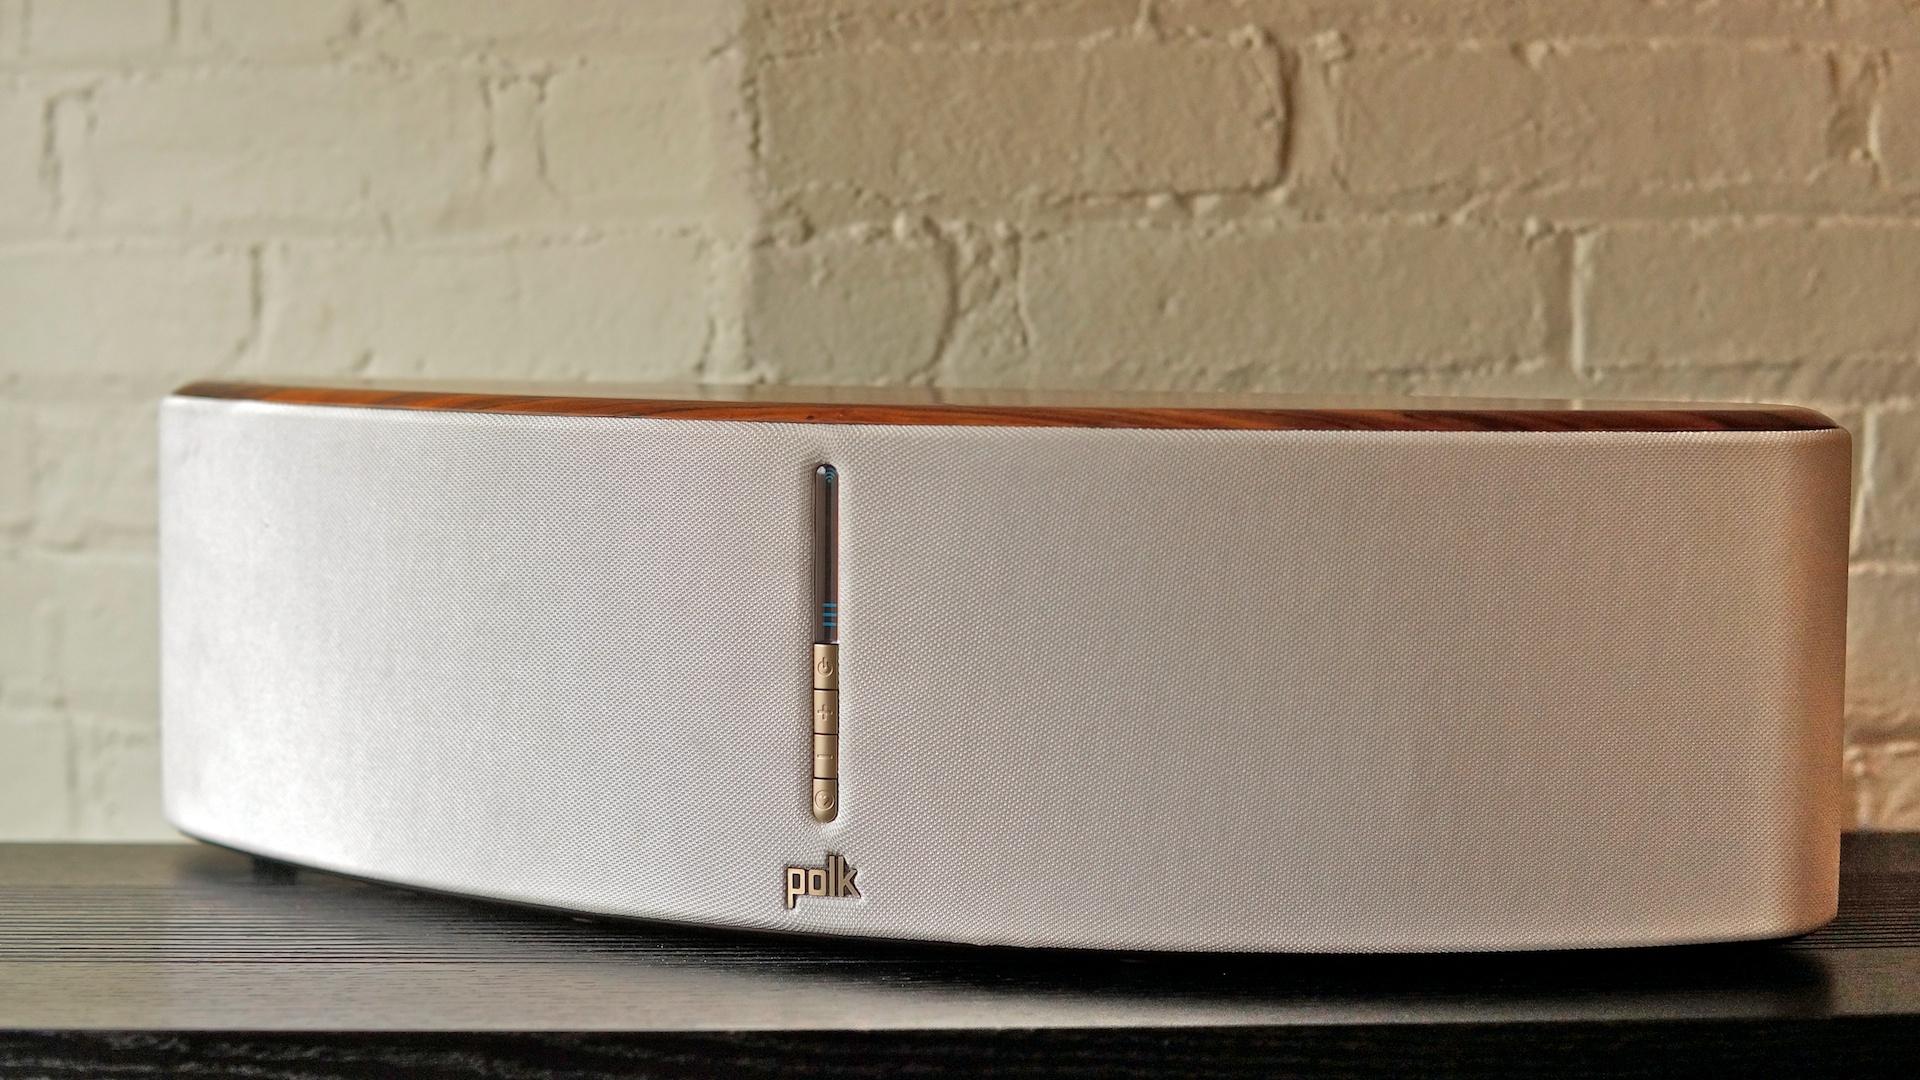 1392758215803 - Test des enceintes Woodbourne de Polk Audio